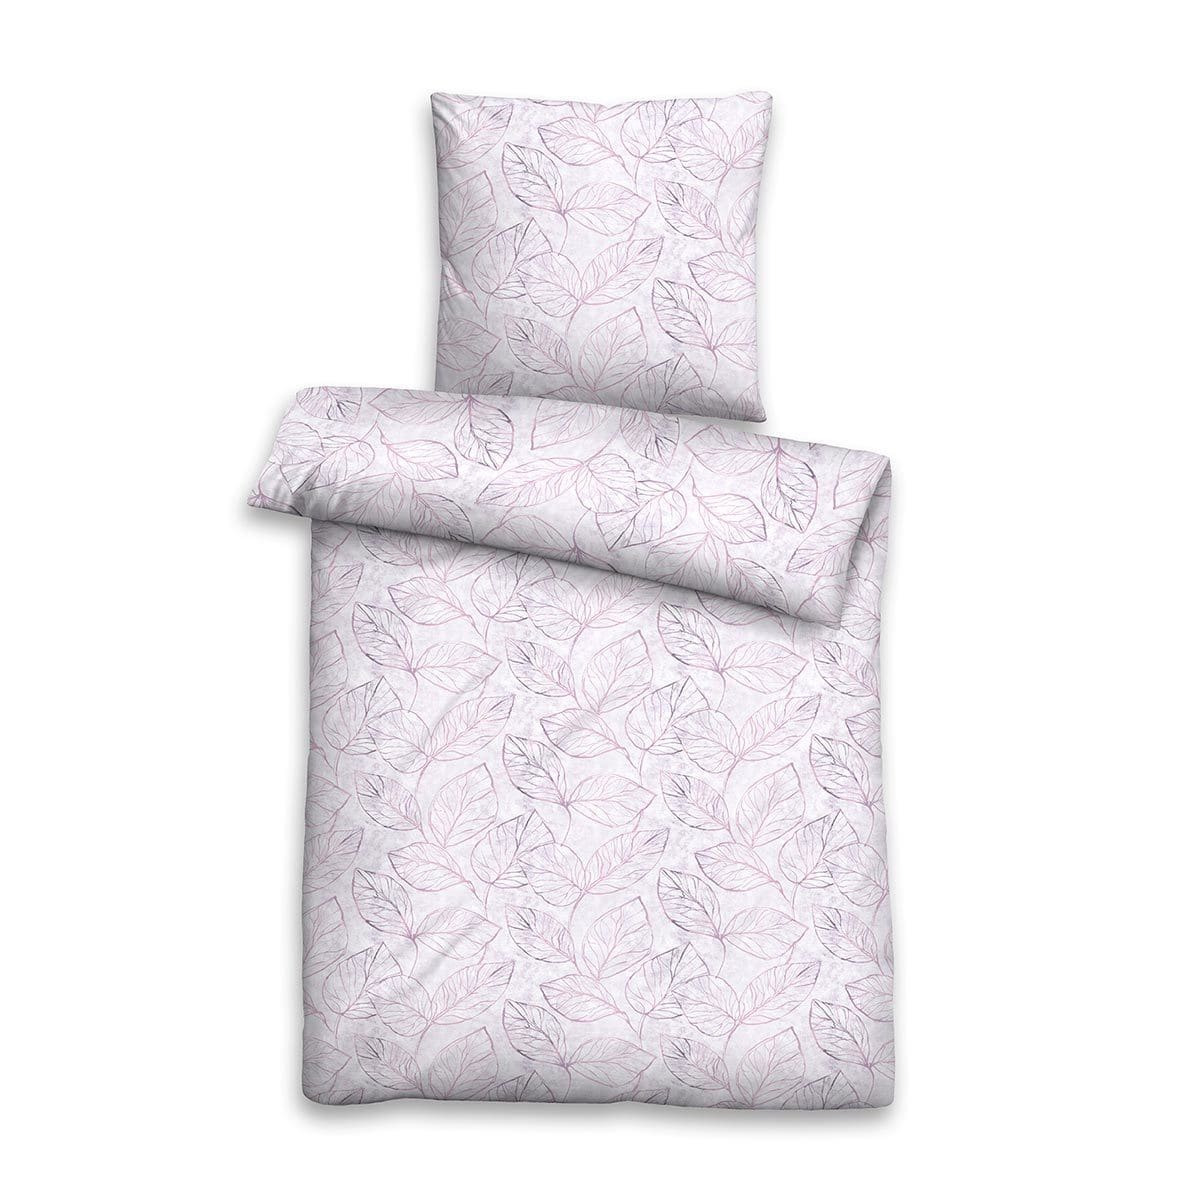 biberna edelflanell bettw sche 85123 324 g nstig online kaufen bei bettwaren shop. Black Bedroom Furniture Sets. Home Design Ideas